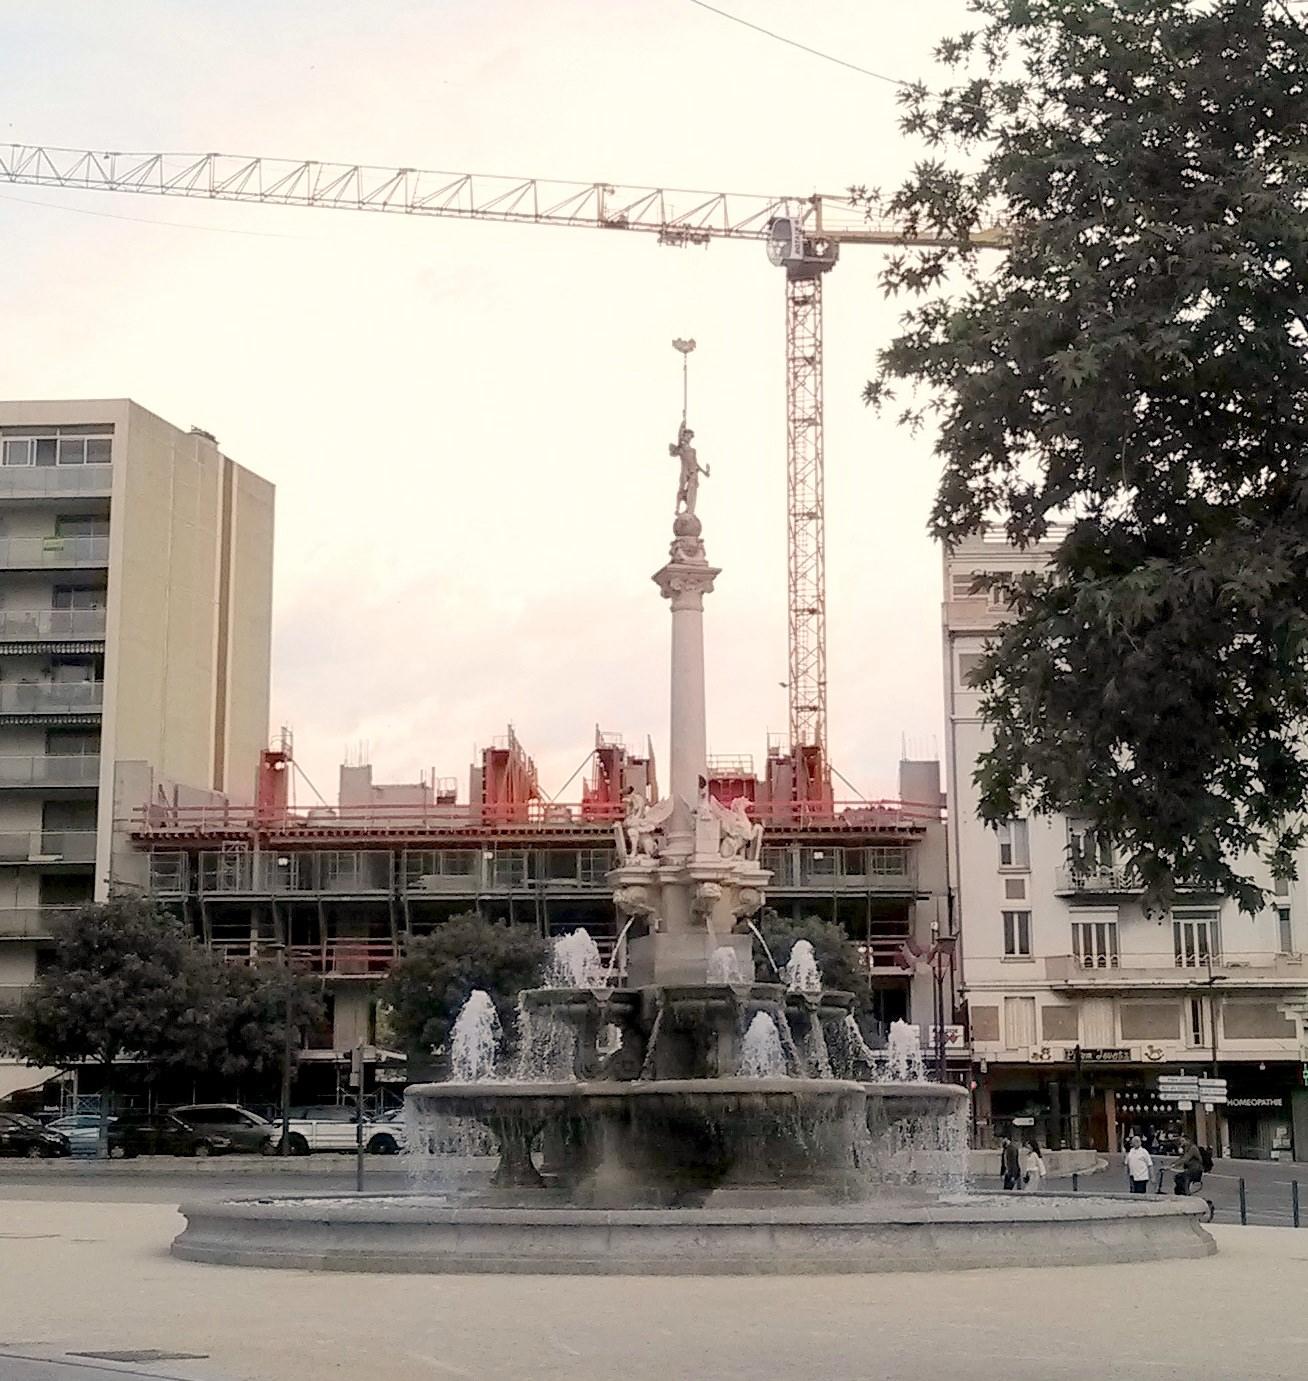 Valence – S03E04